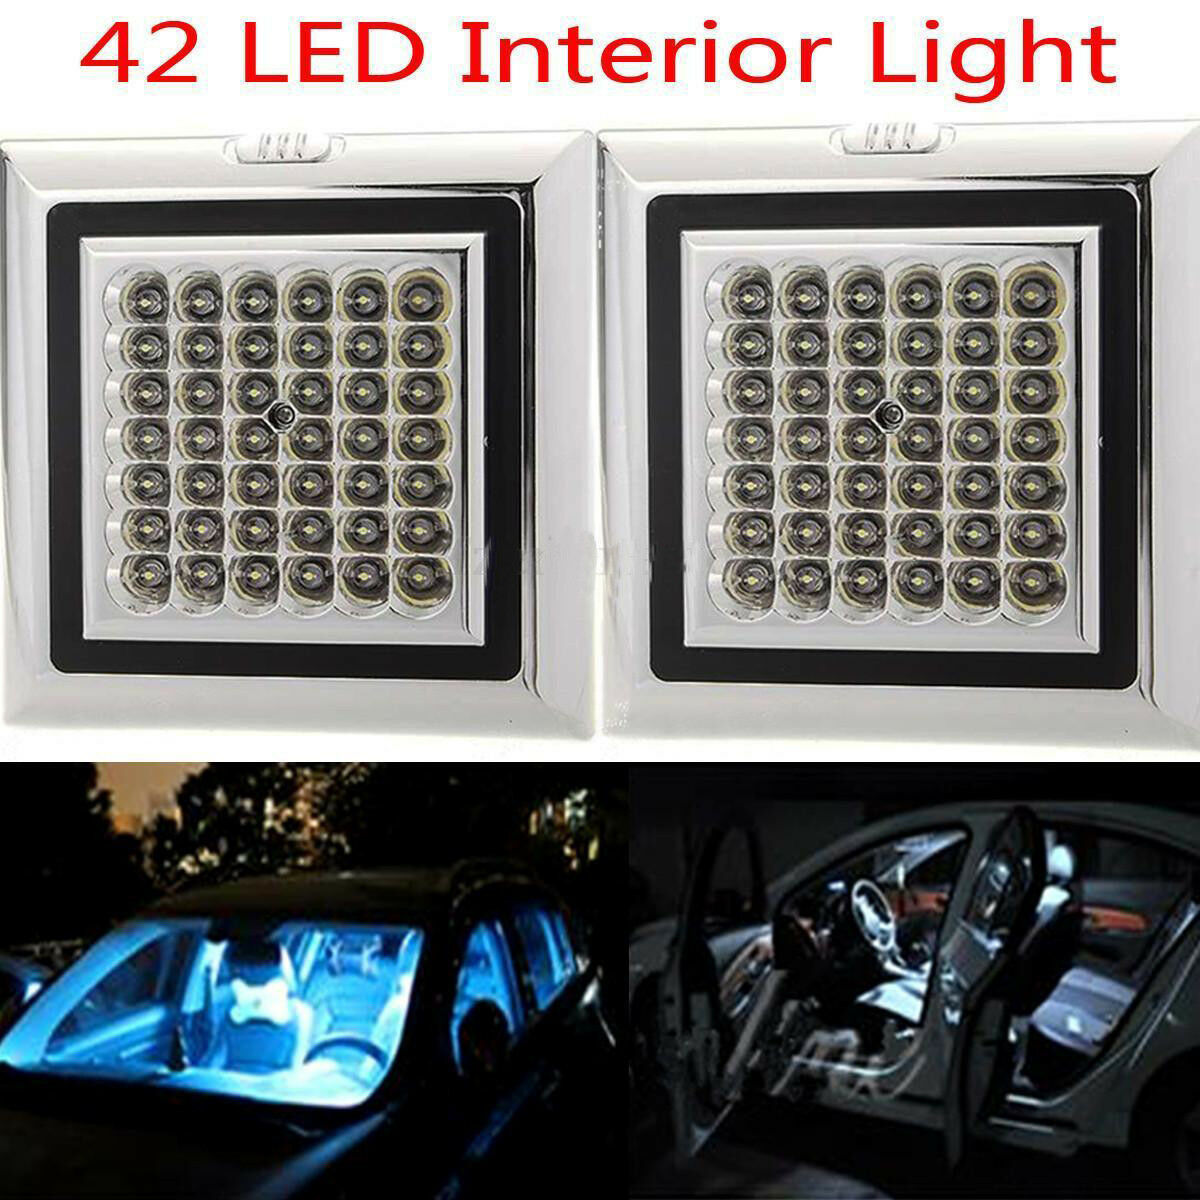 12 V Volt 42 Led Interior Ceiling Cabin Light Lamp For Caravan Boat Truck Car